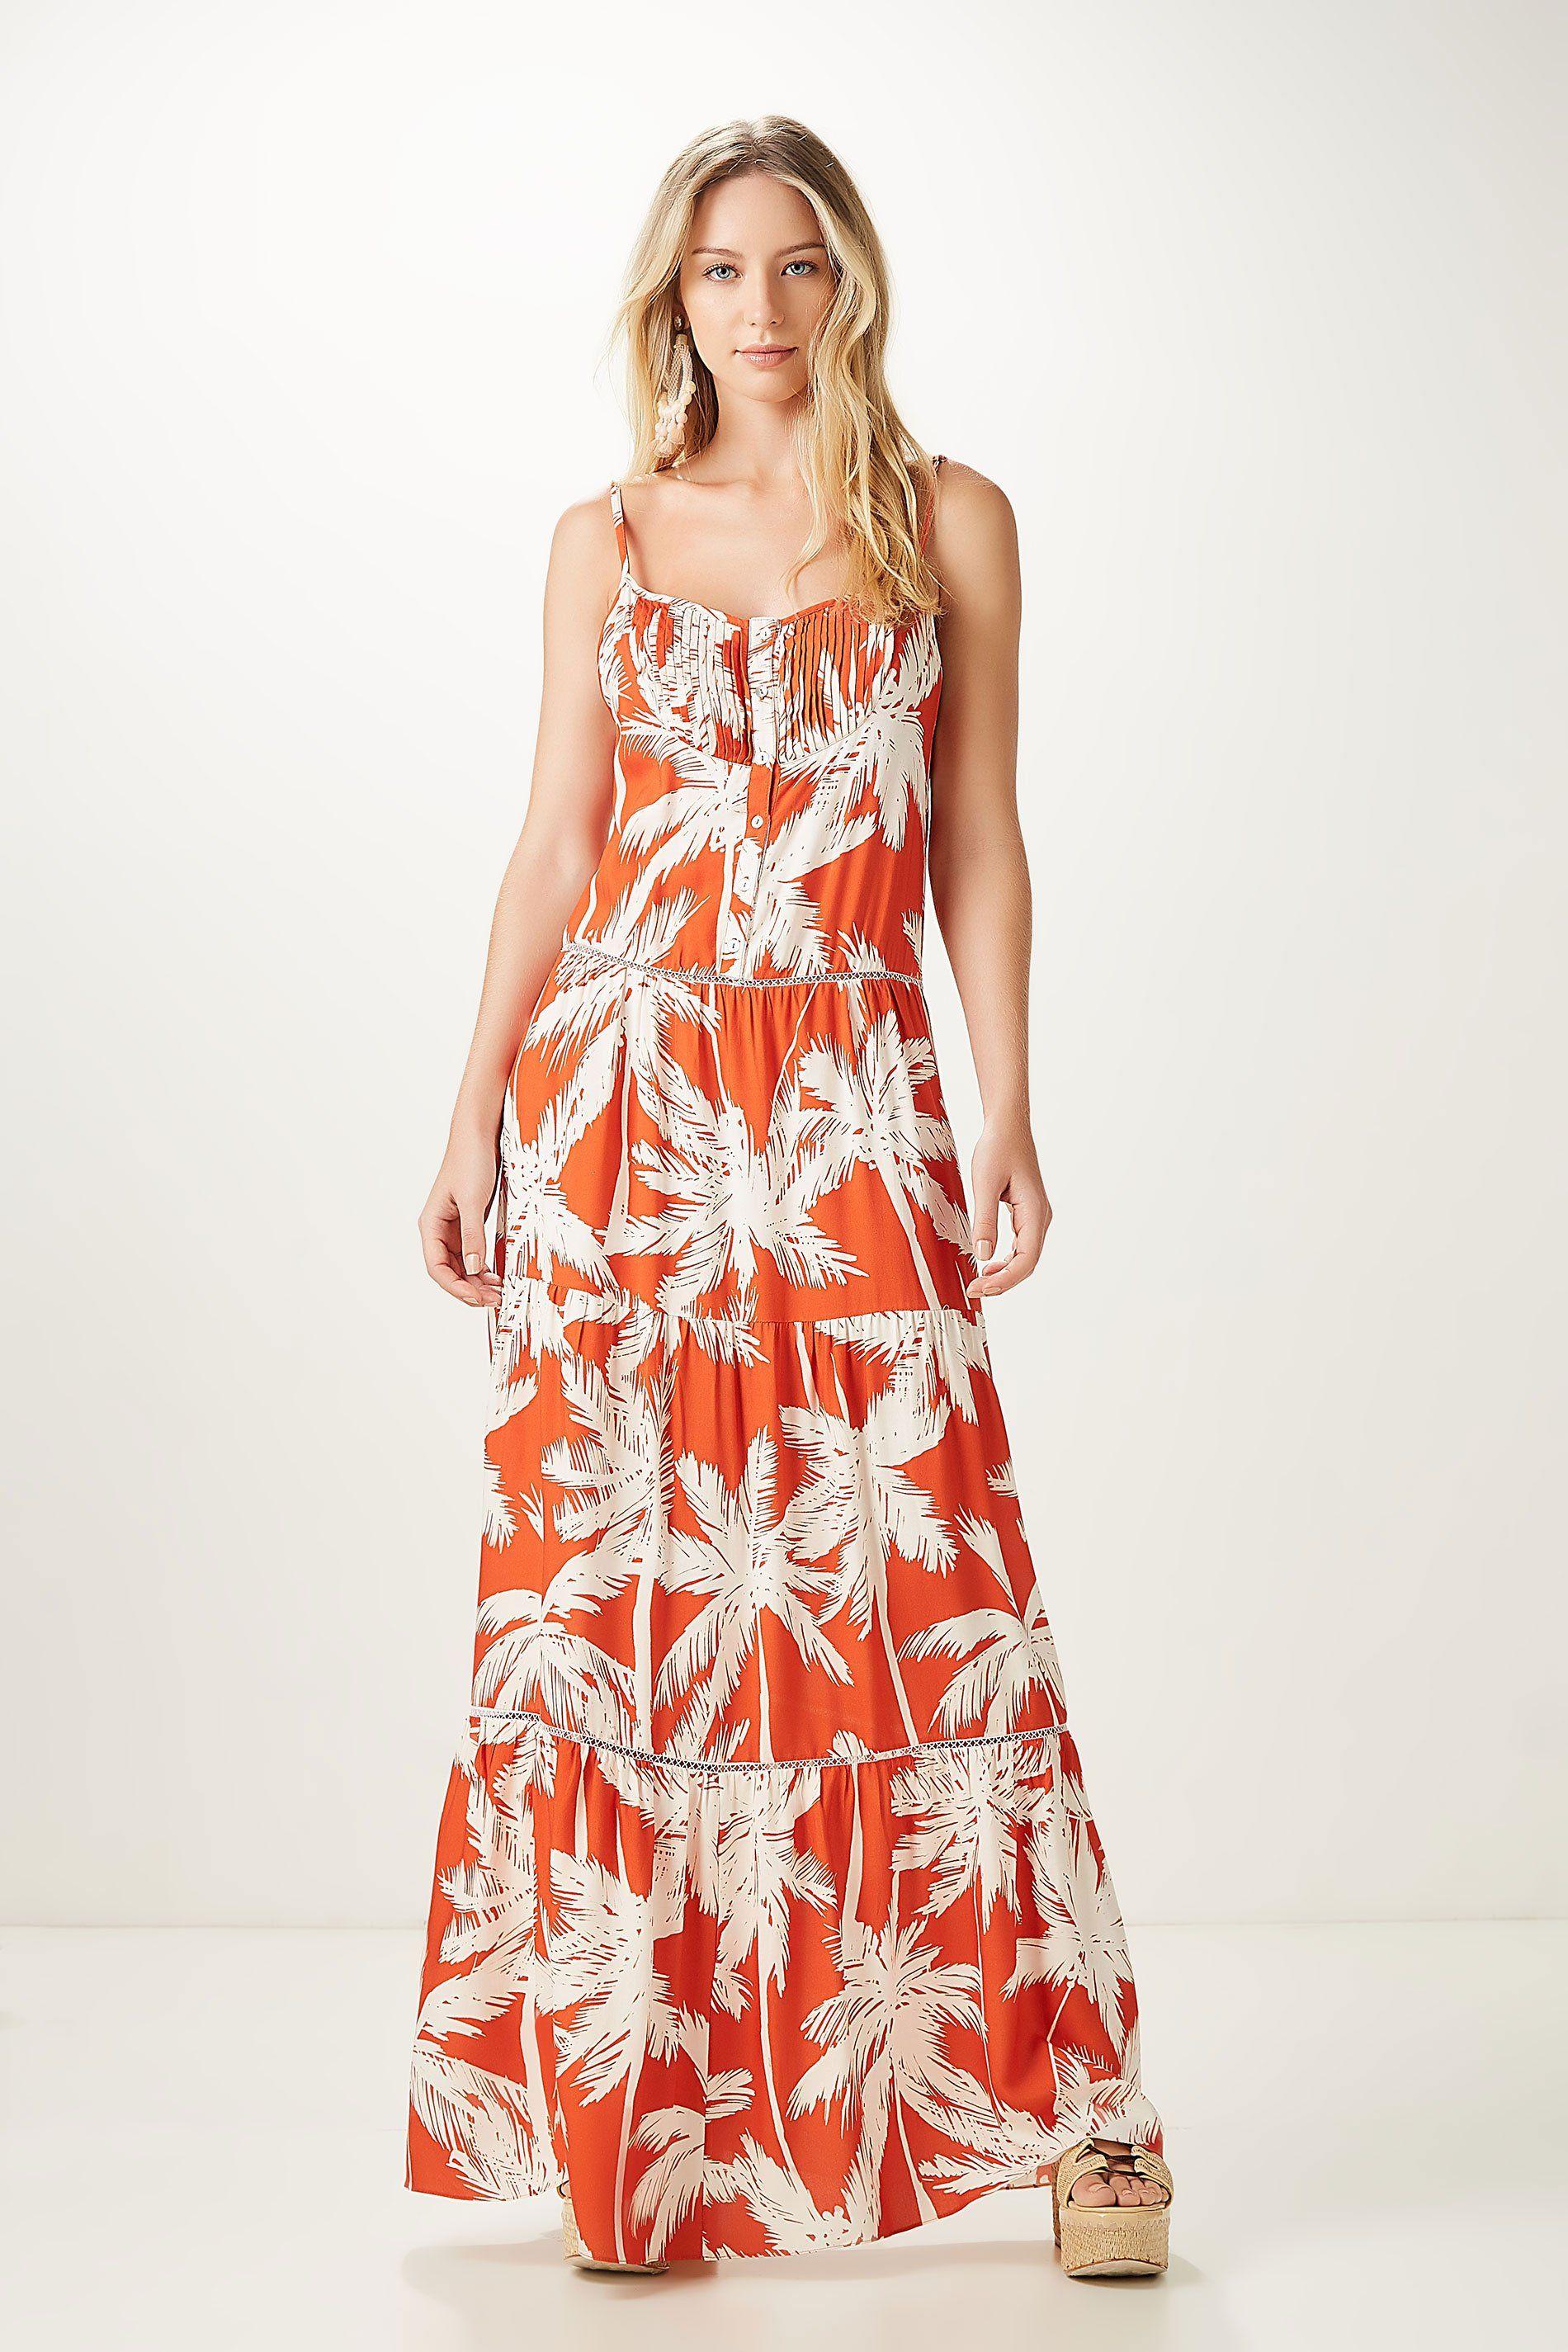 dba107ac9 vestido longo coqueiro laranja | ANIMALE | Clothing | Dresses ...